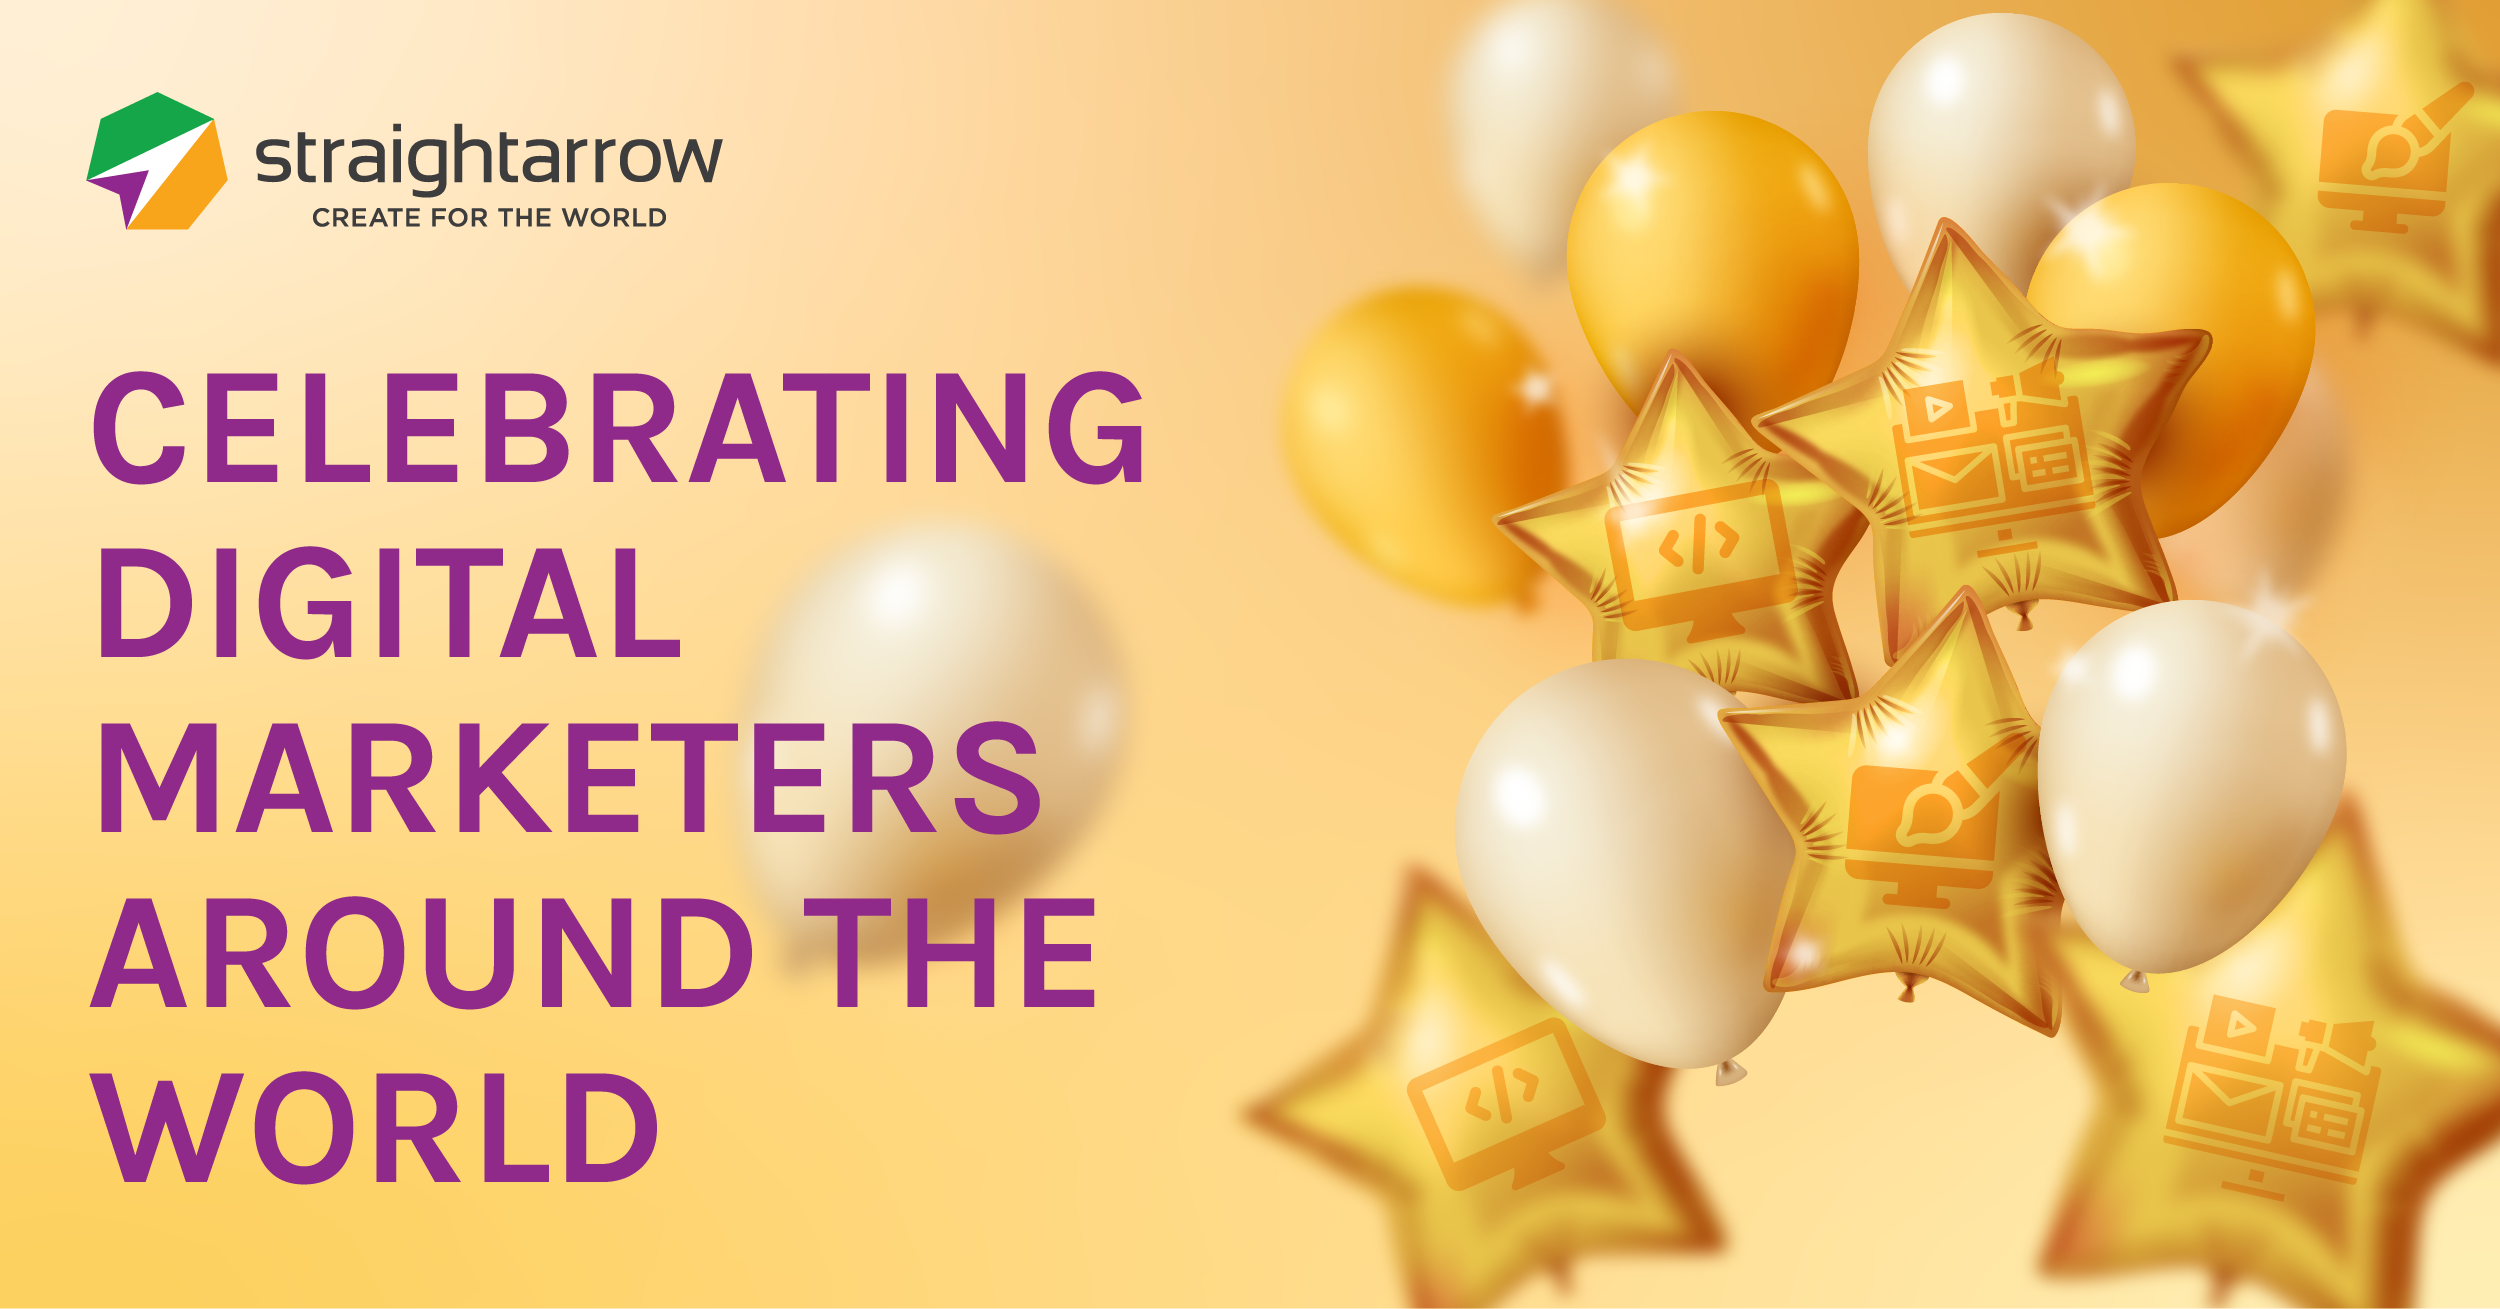 Celebrating Digital Marketers Around the World